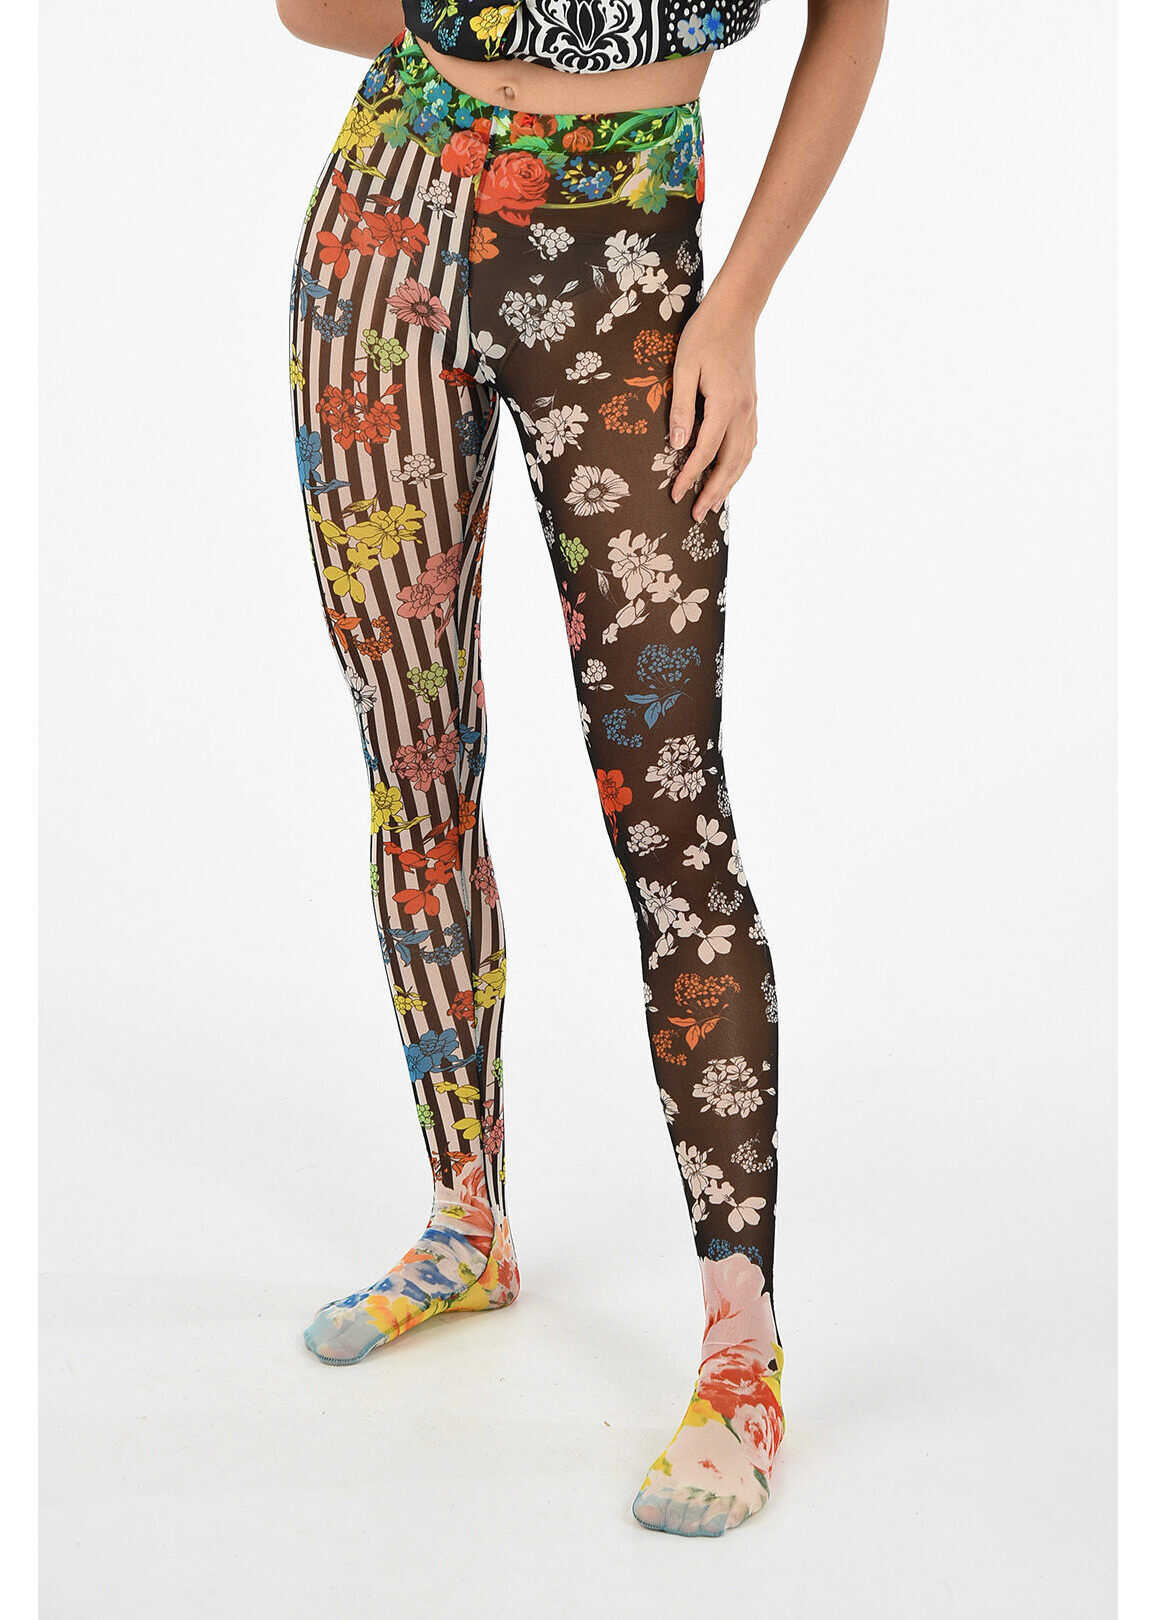 Versace floral-print slim fit leggings MULTICOLOR